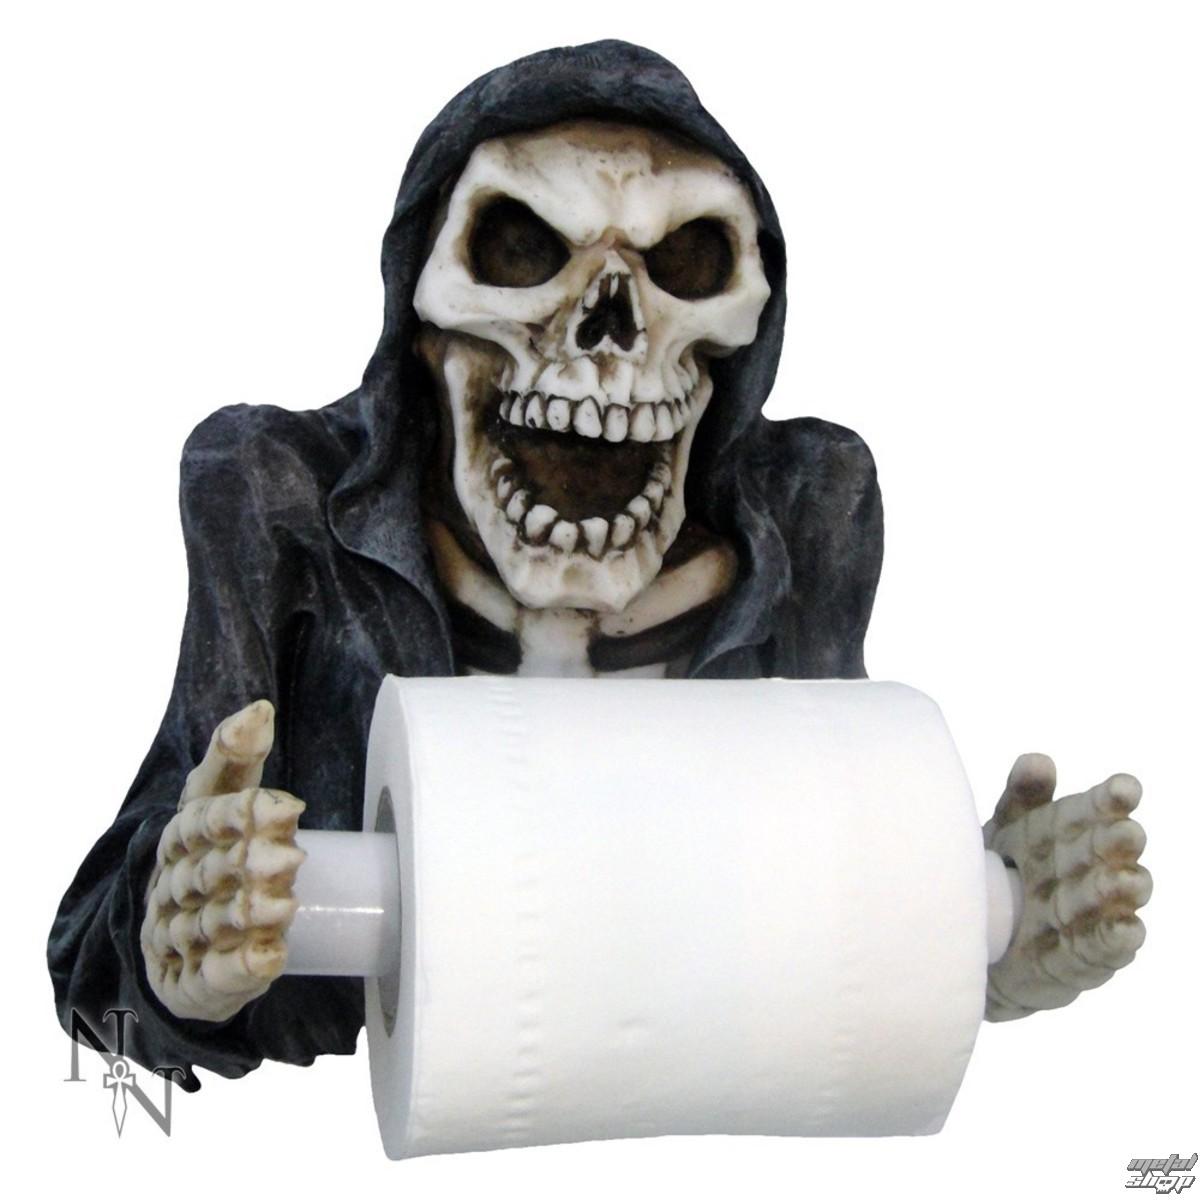 držiak na toaletné papier Reapers Revenge - AL50354